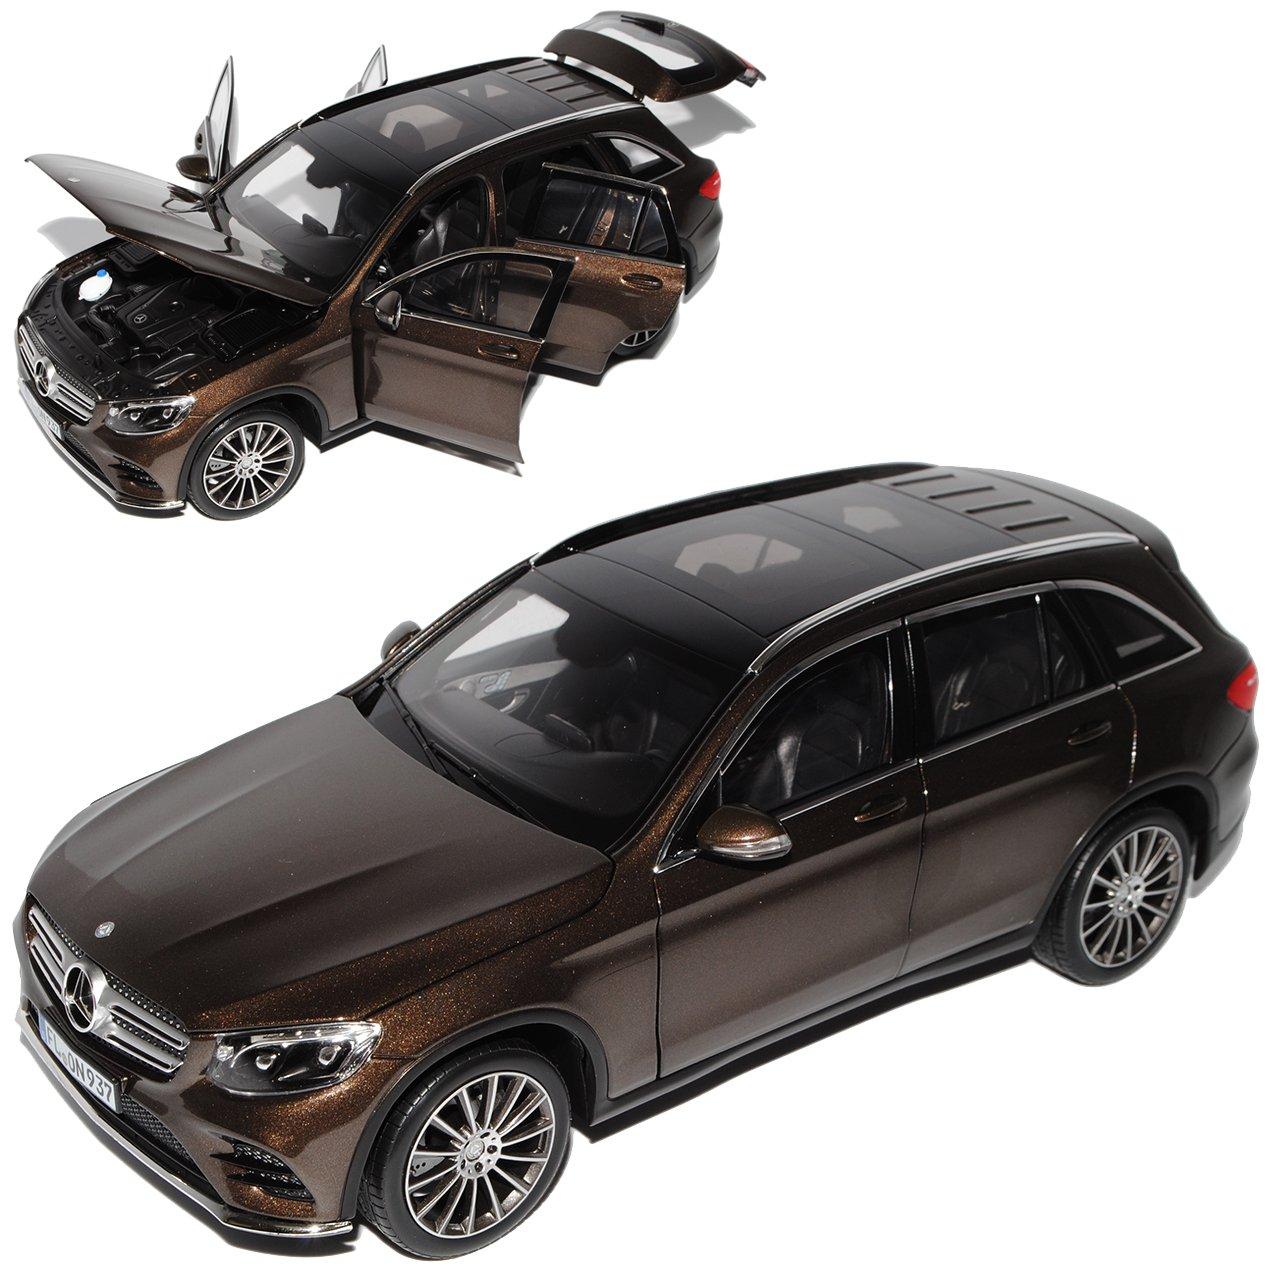 Norev Mercedes-Benz GLC X253 SUV Braun Metallic Ab 2015 1/18 Modell Auto